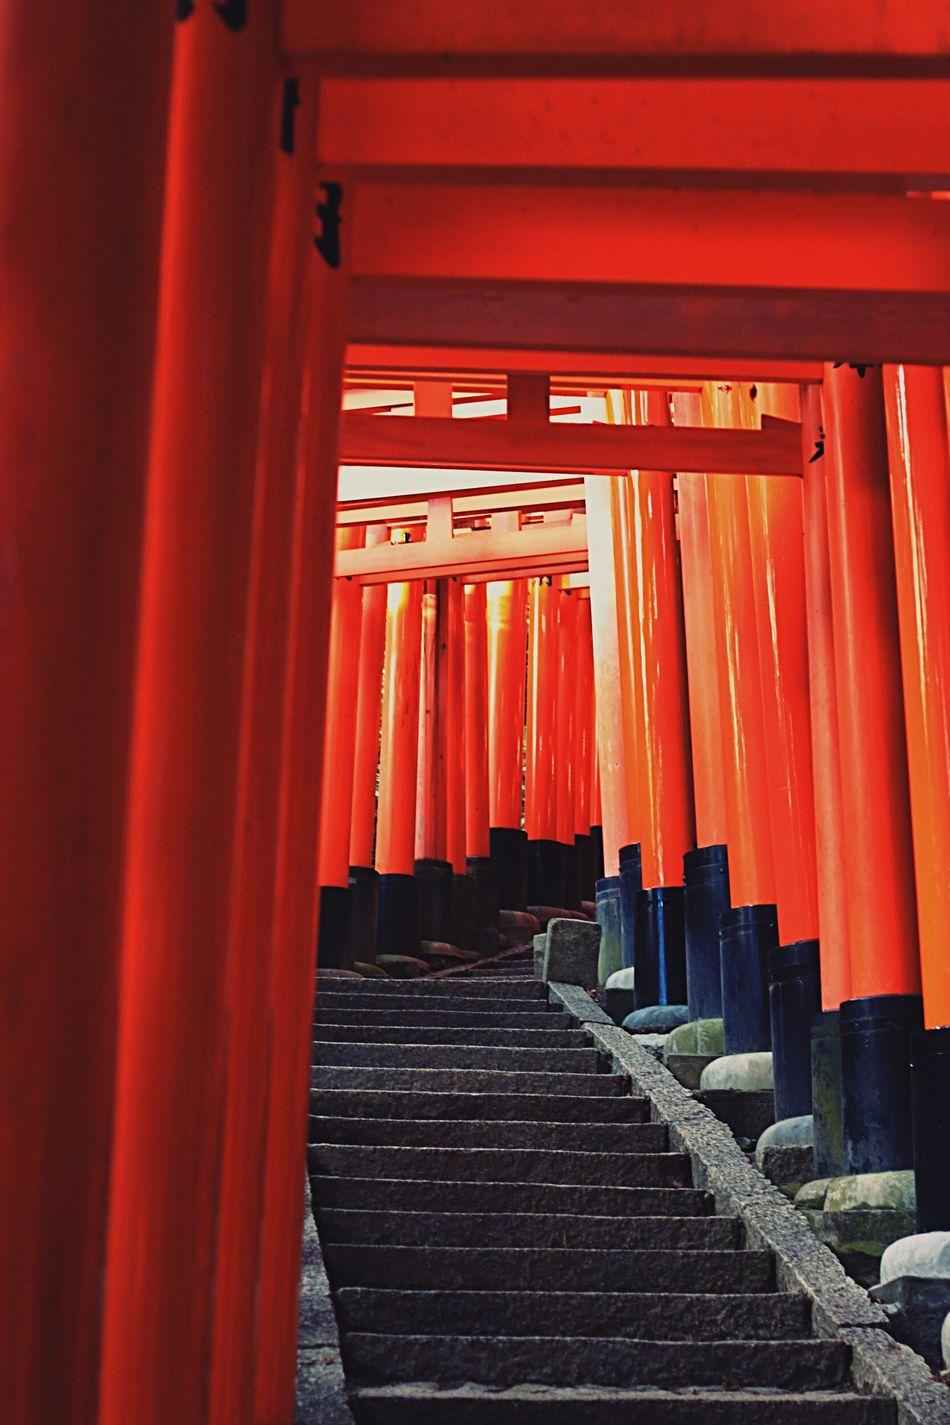 Torii heaven Fushimi Inari Shrine Kyoto Japan TORII Religion Spirituality Place Of Worship Red Cultures EyeEmNewHere Shrine Day Built Structure Architecture